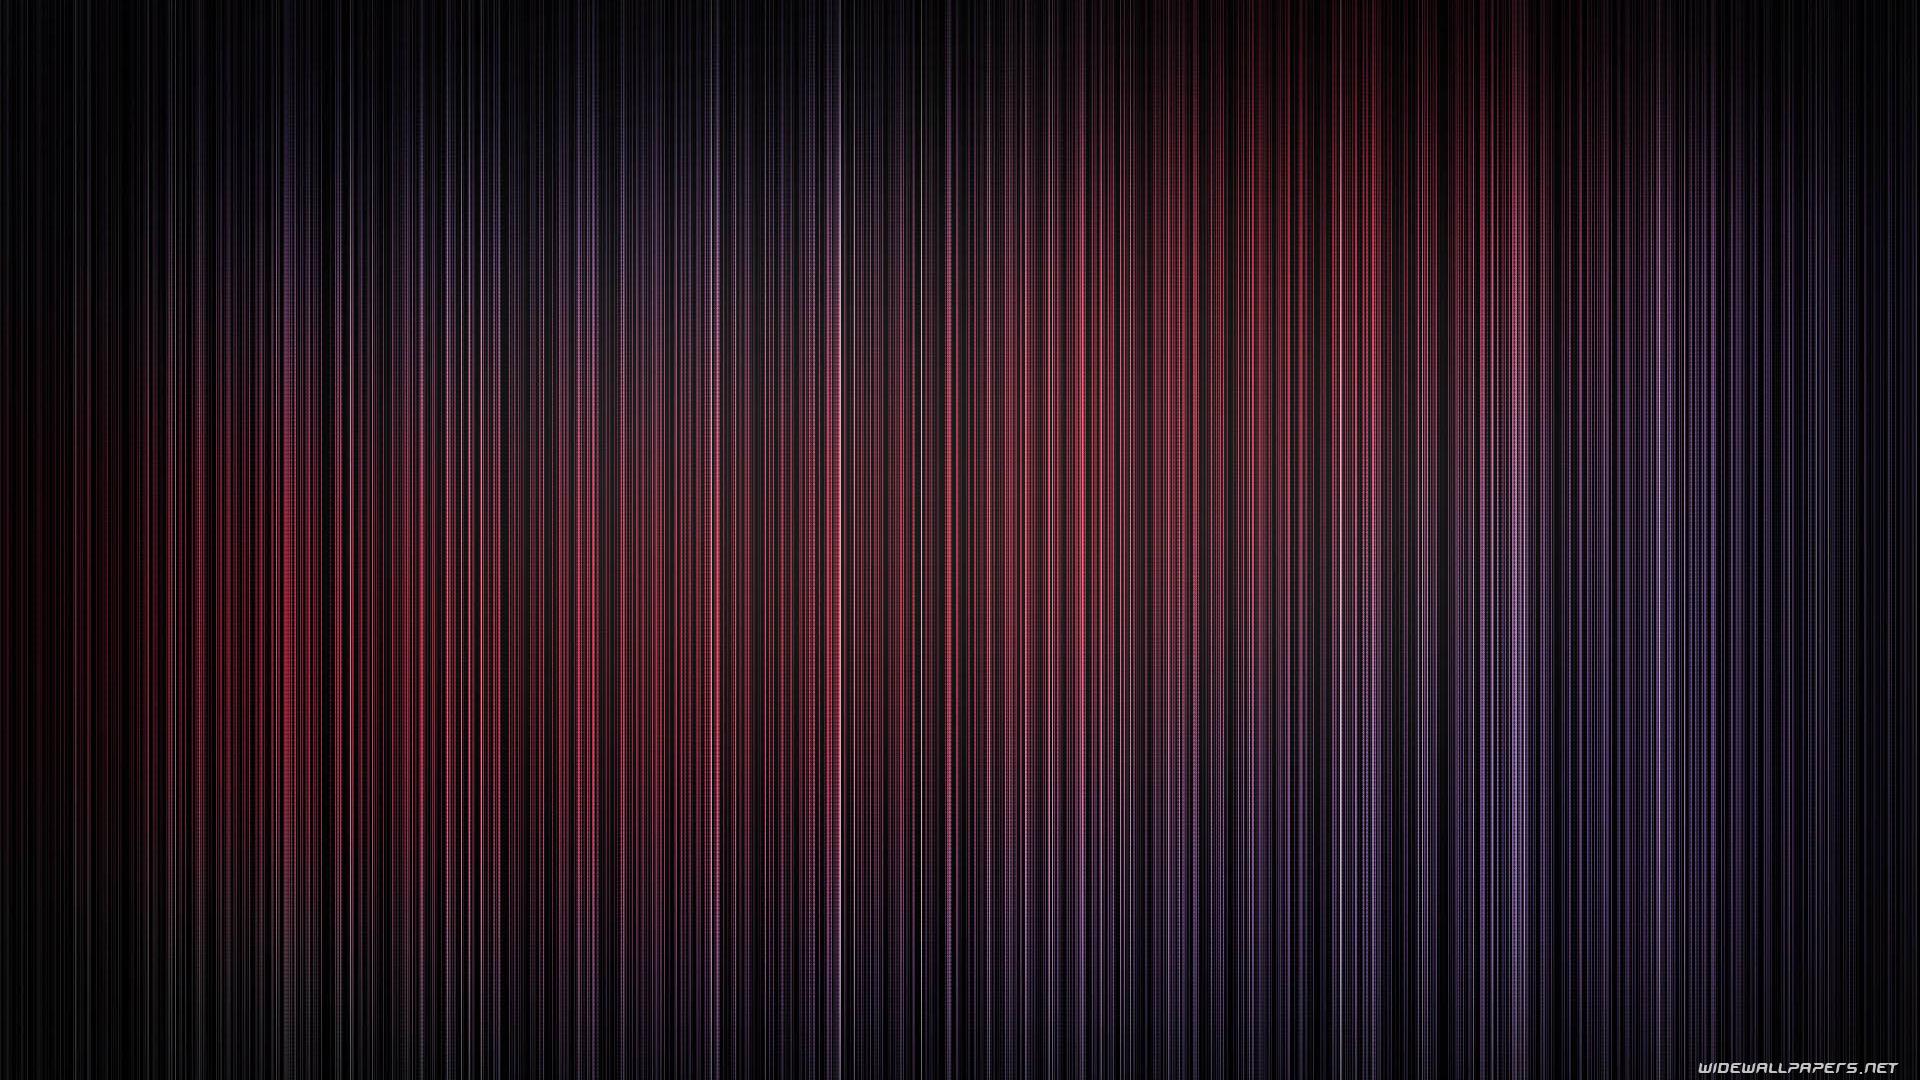 Iphone 5 Wallpaper Pink Black And Pink Wallpaper 57 Cool Hd Wallpaper